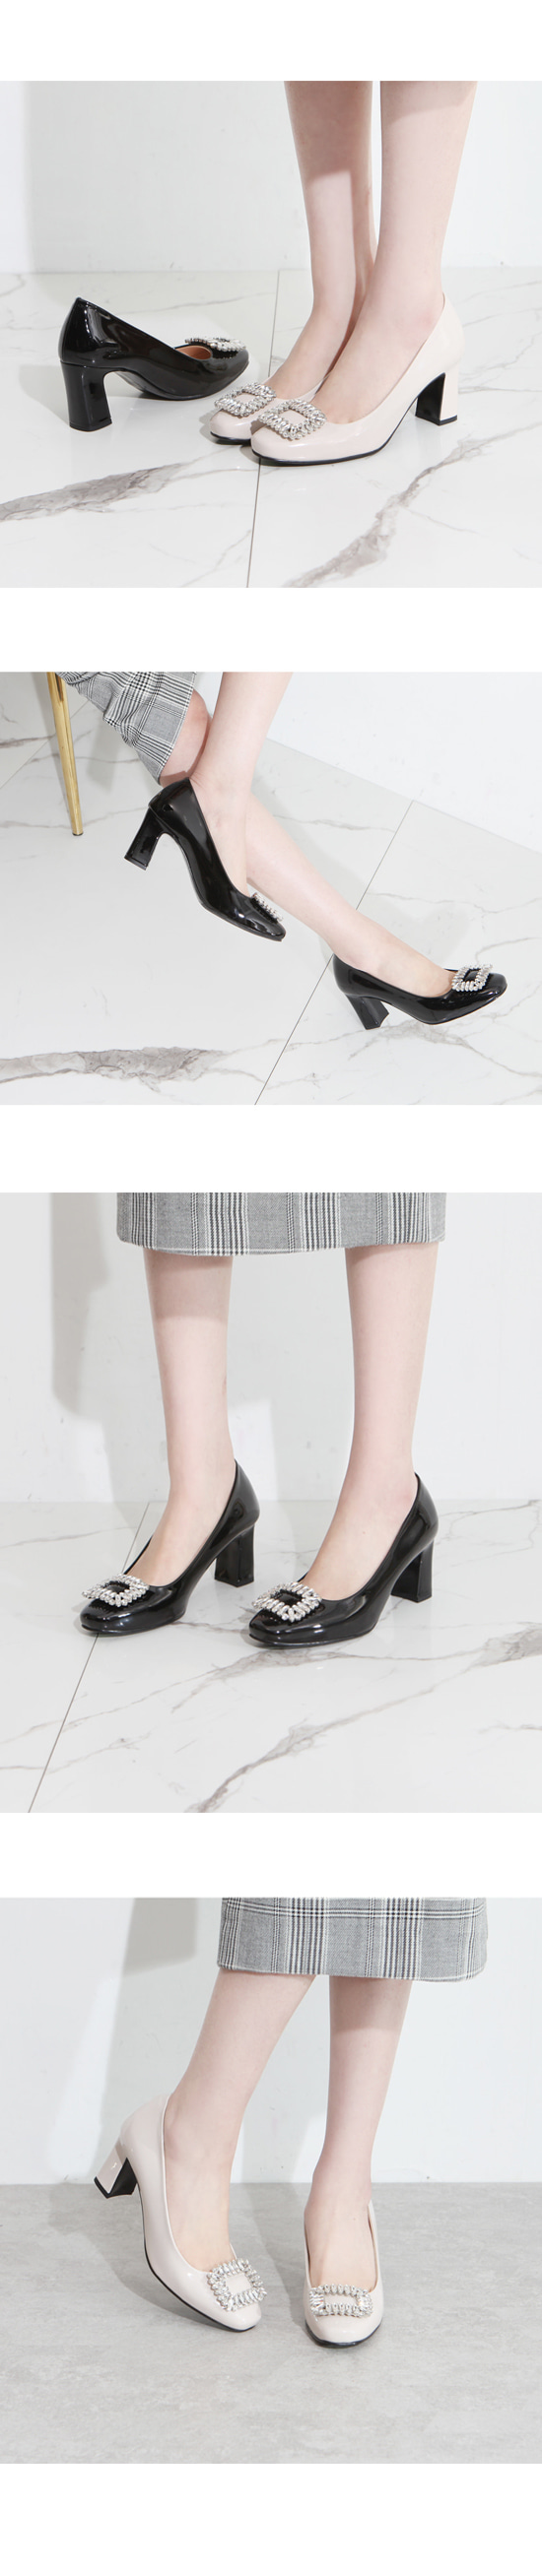 Enamel cubic beads high heel shoes beige